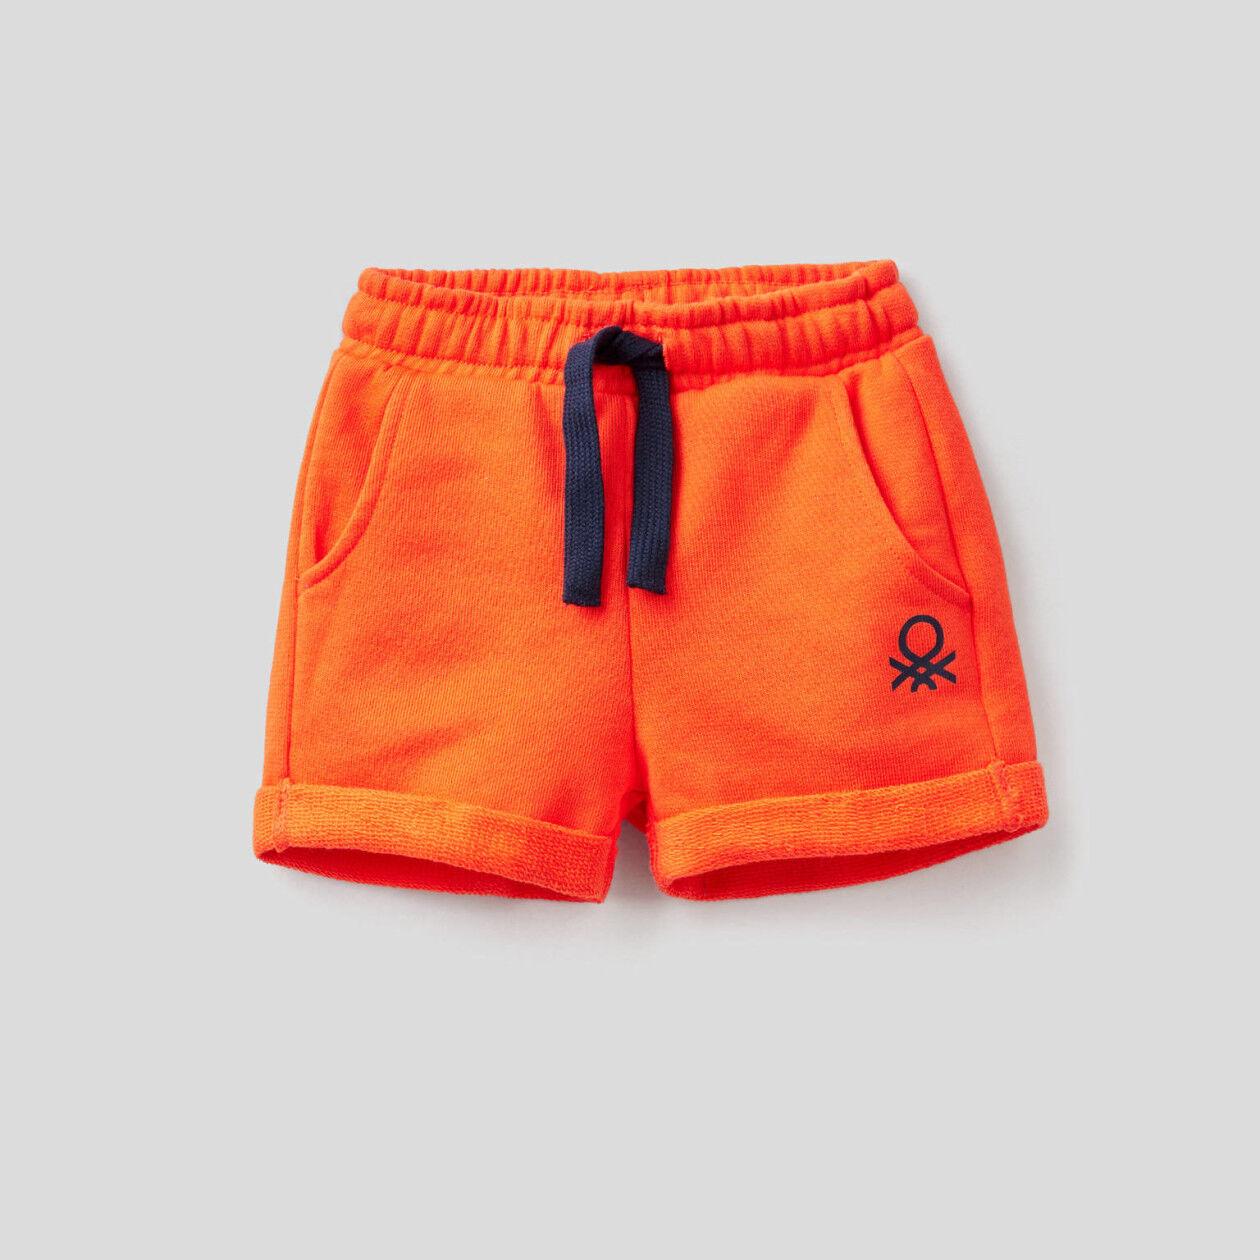 Pantalón corto en felpa de 100% algodón